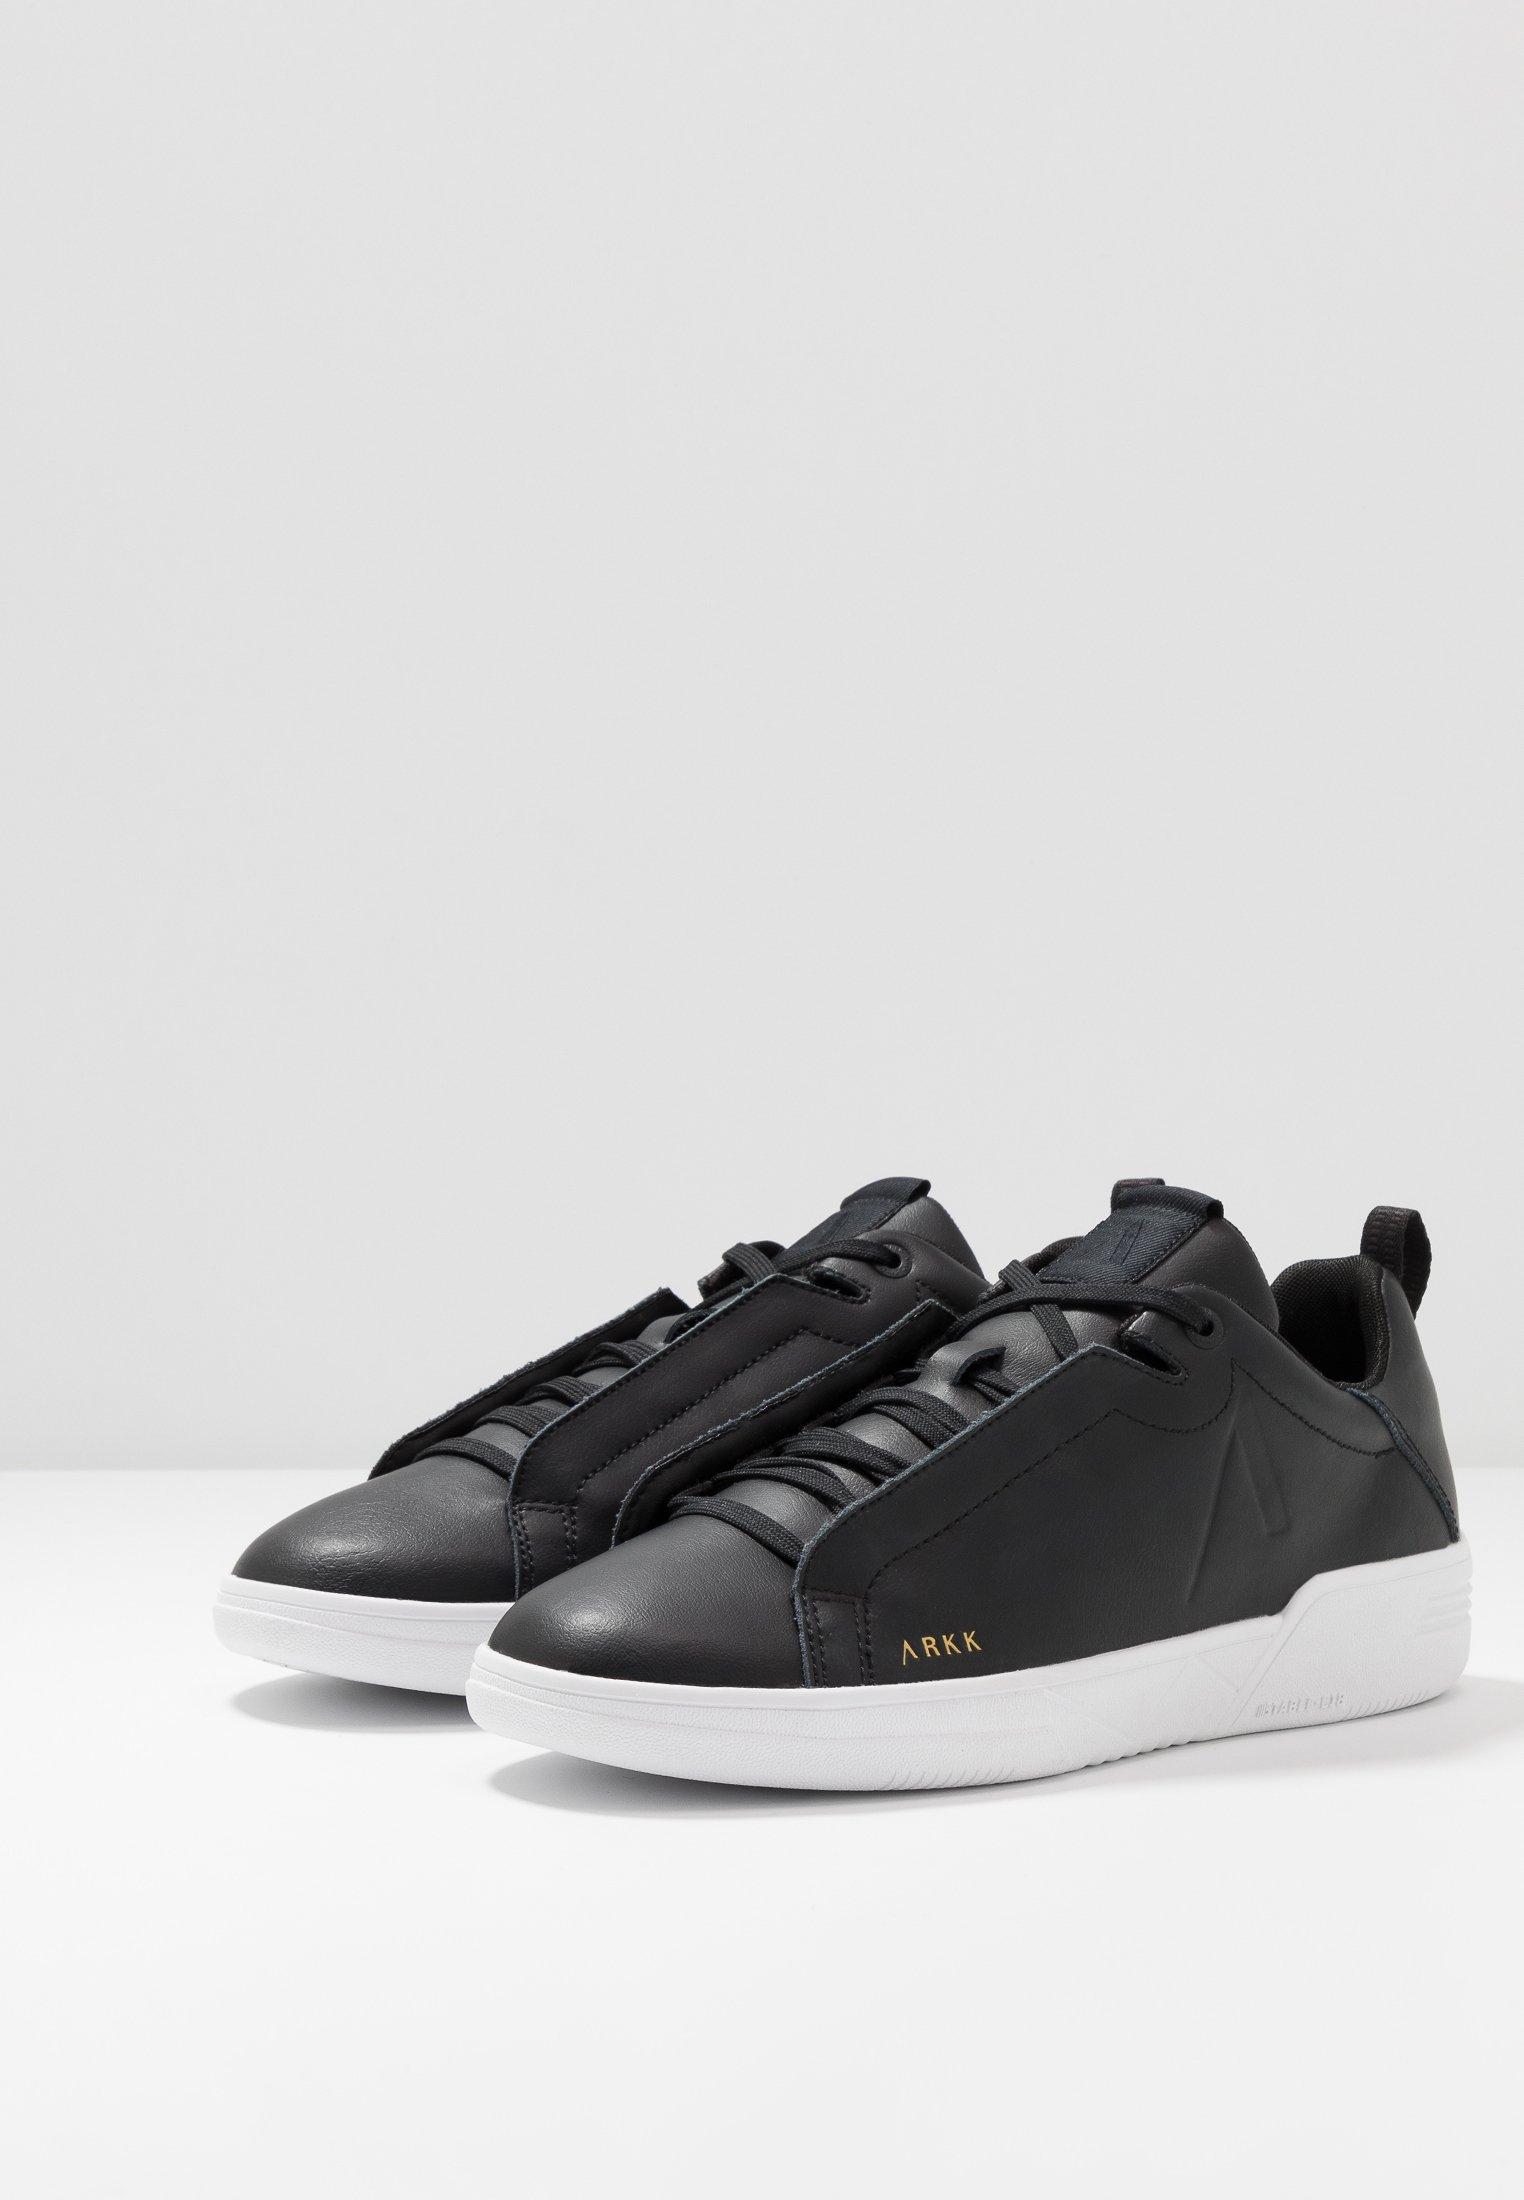 ARKK Copenhagen UNIKLASS - Sneaker low - black - Black Friday